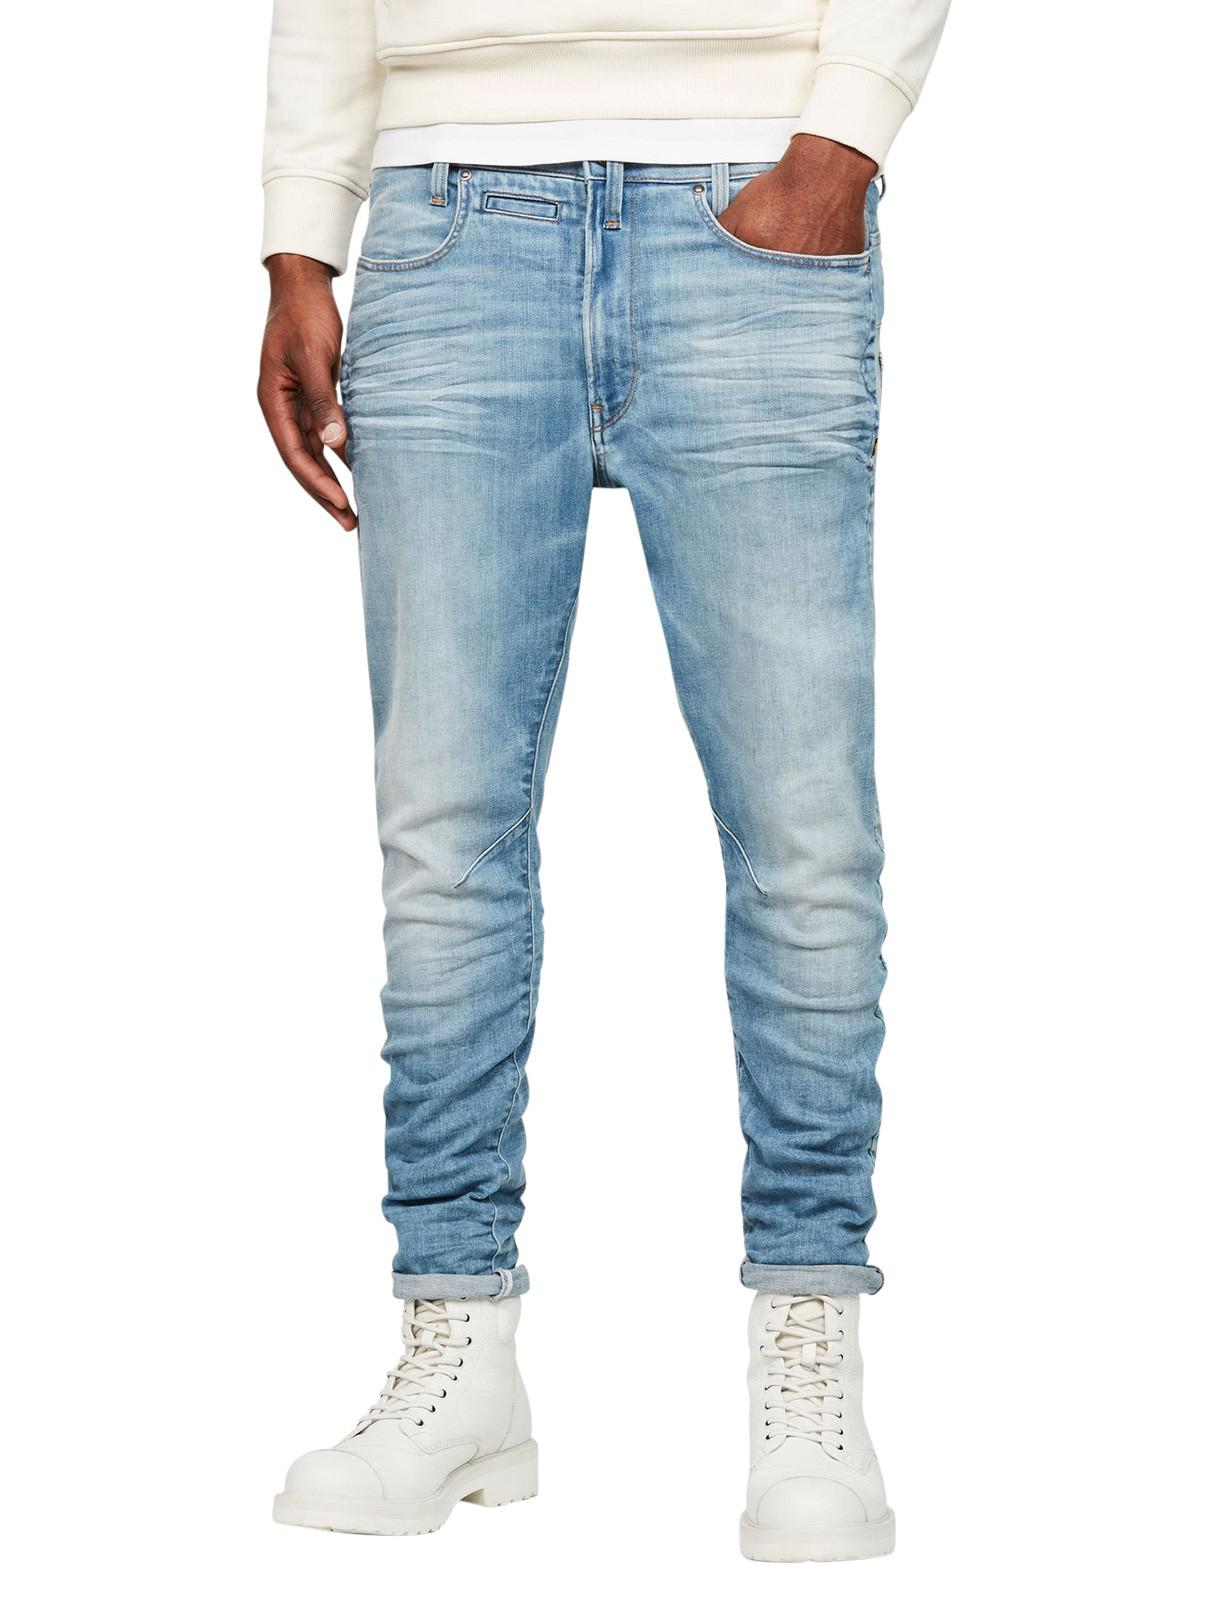 9e9e38cf6139 Lyst - G-Star RAW Light Indigo Aged D- Staq 3d Super Slim Jeans in ...